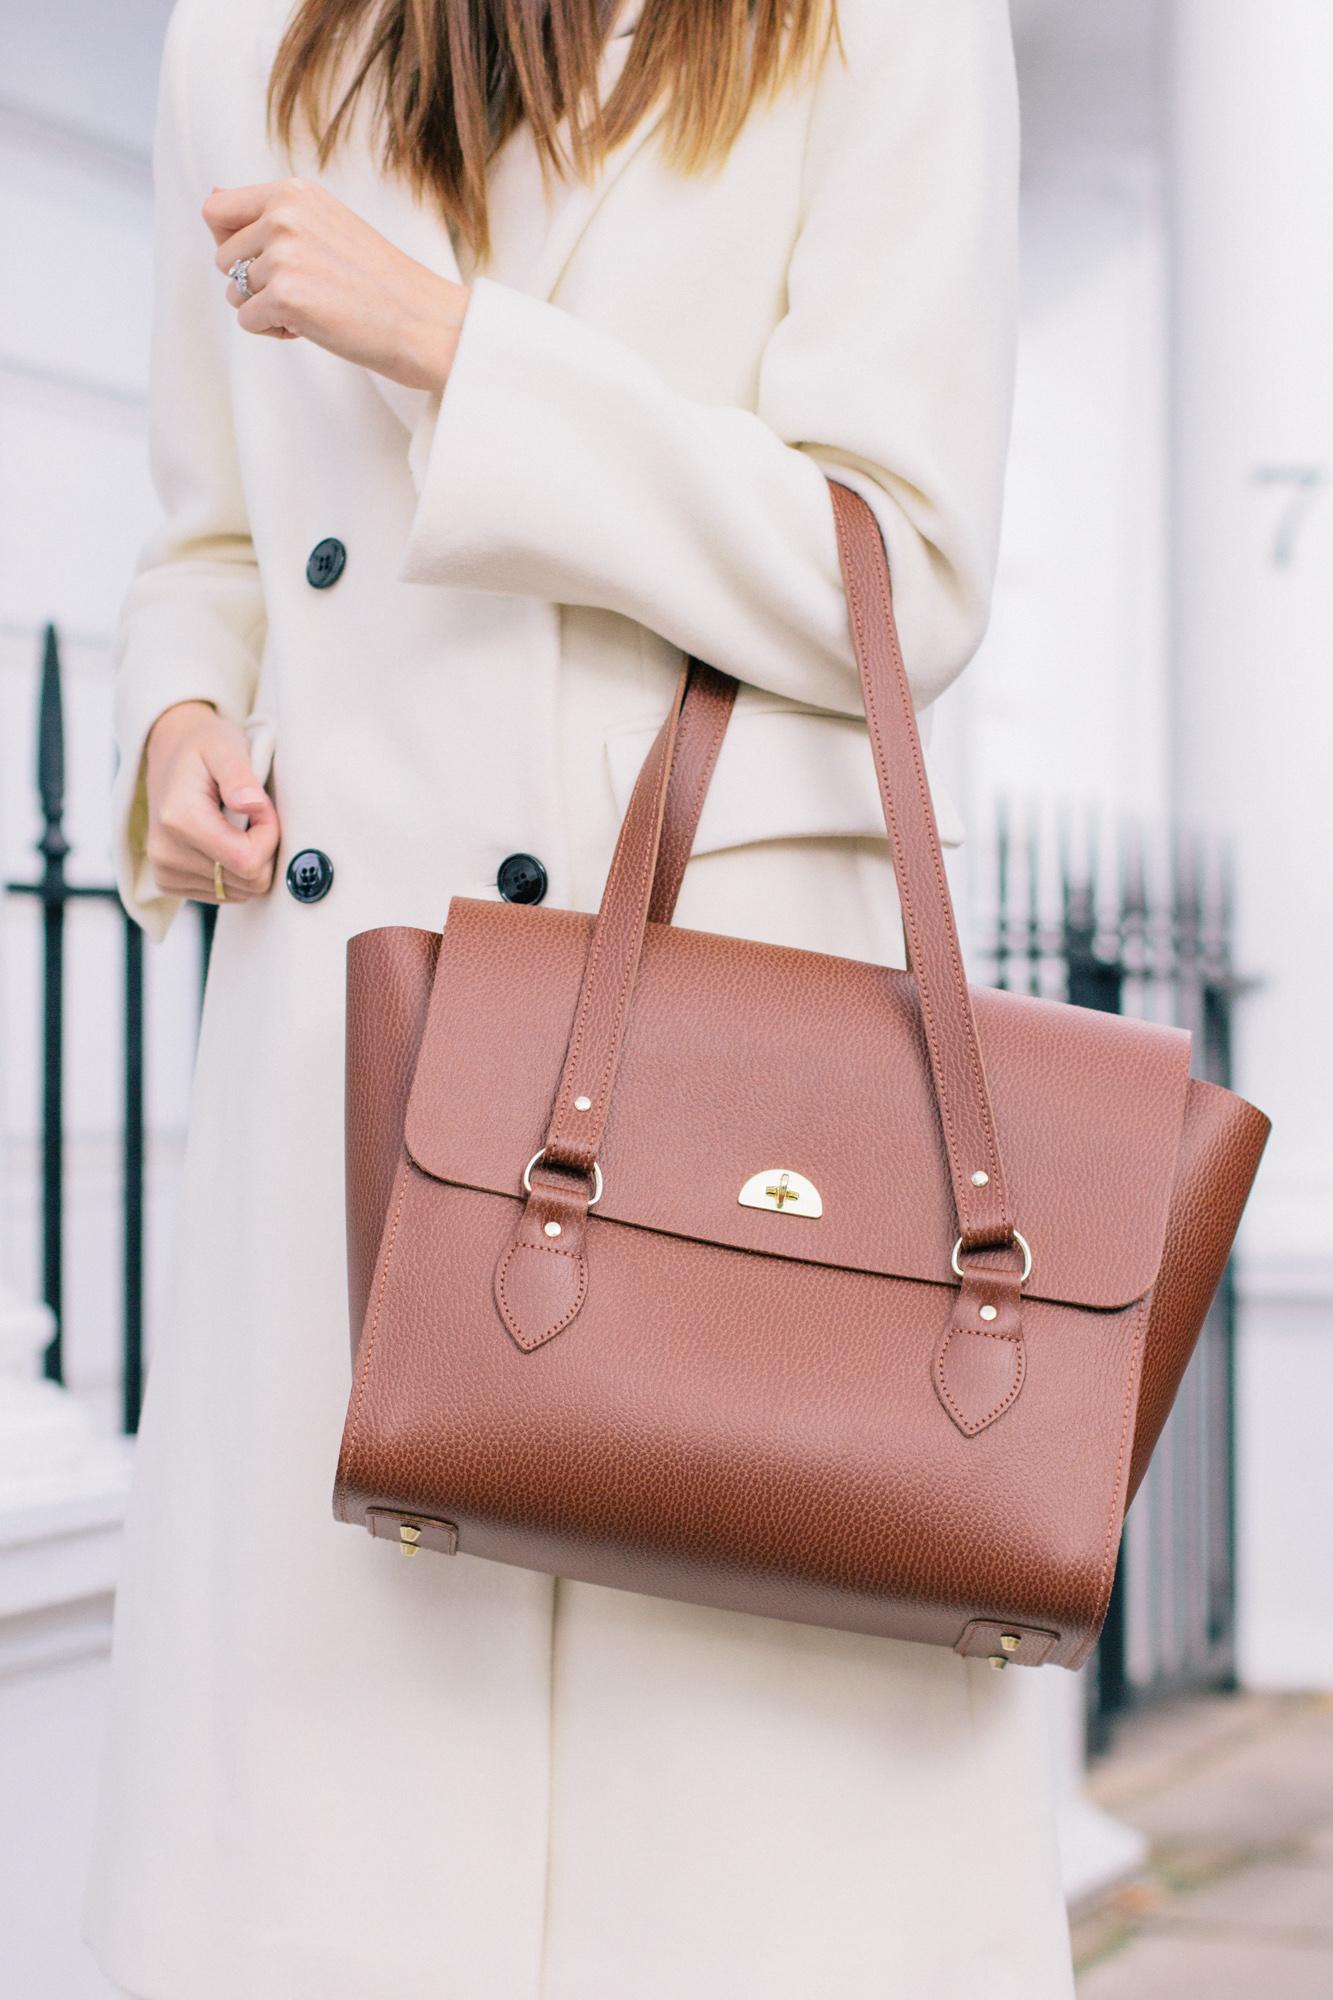 Cambridge Satchel Company Emily Bag Sundays and Somedays-4.jpg